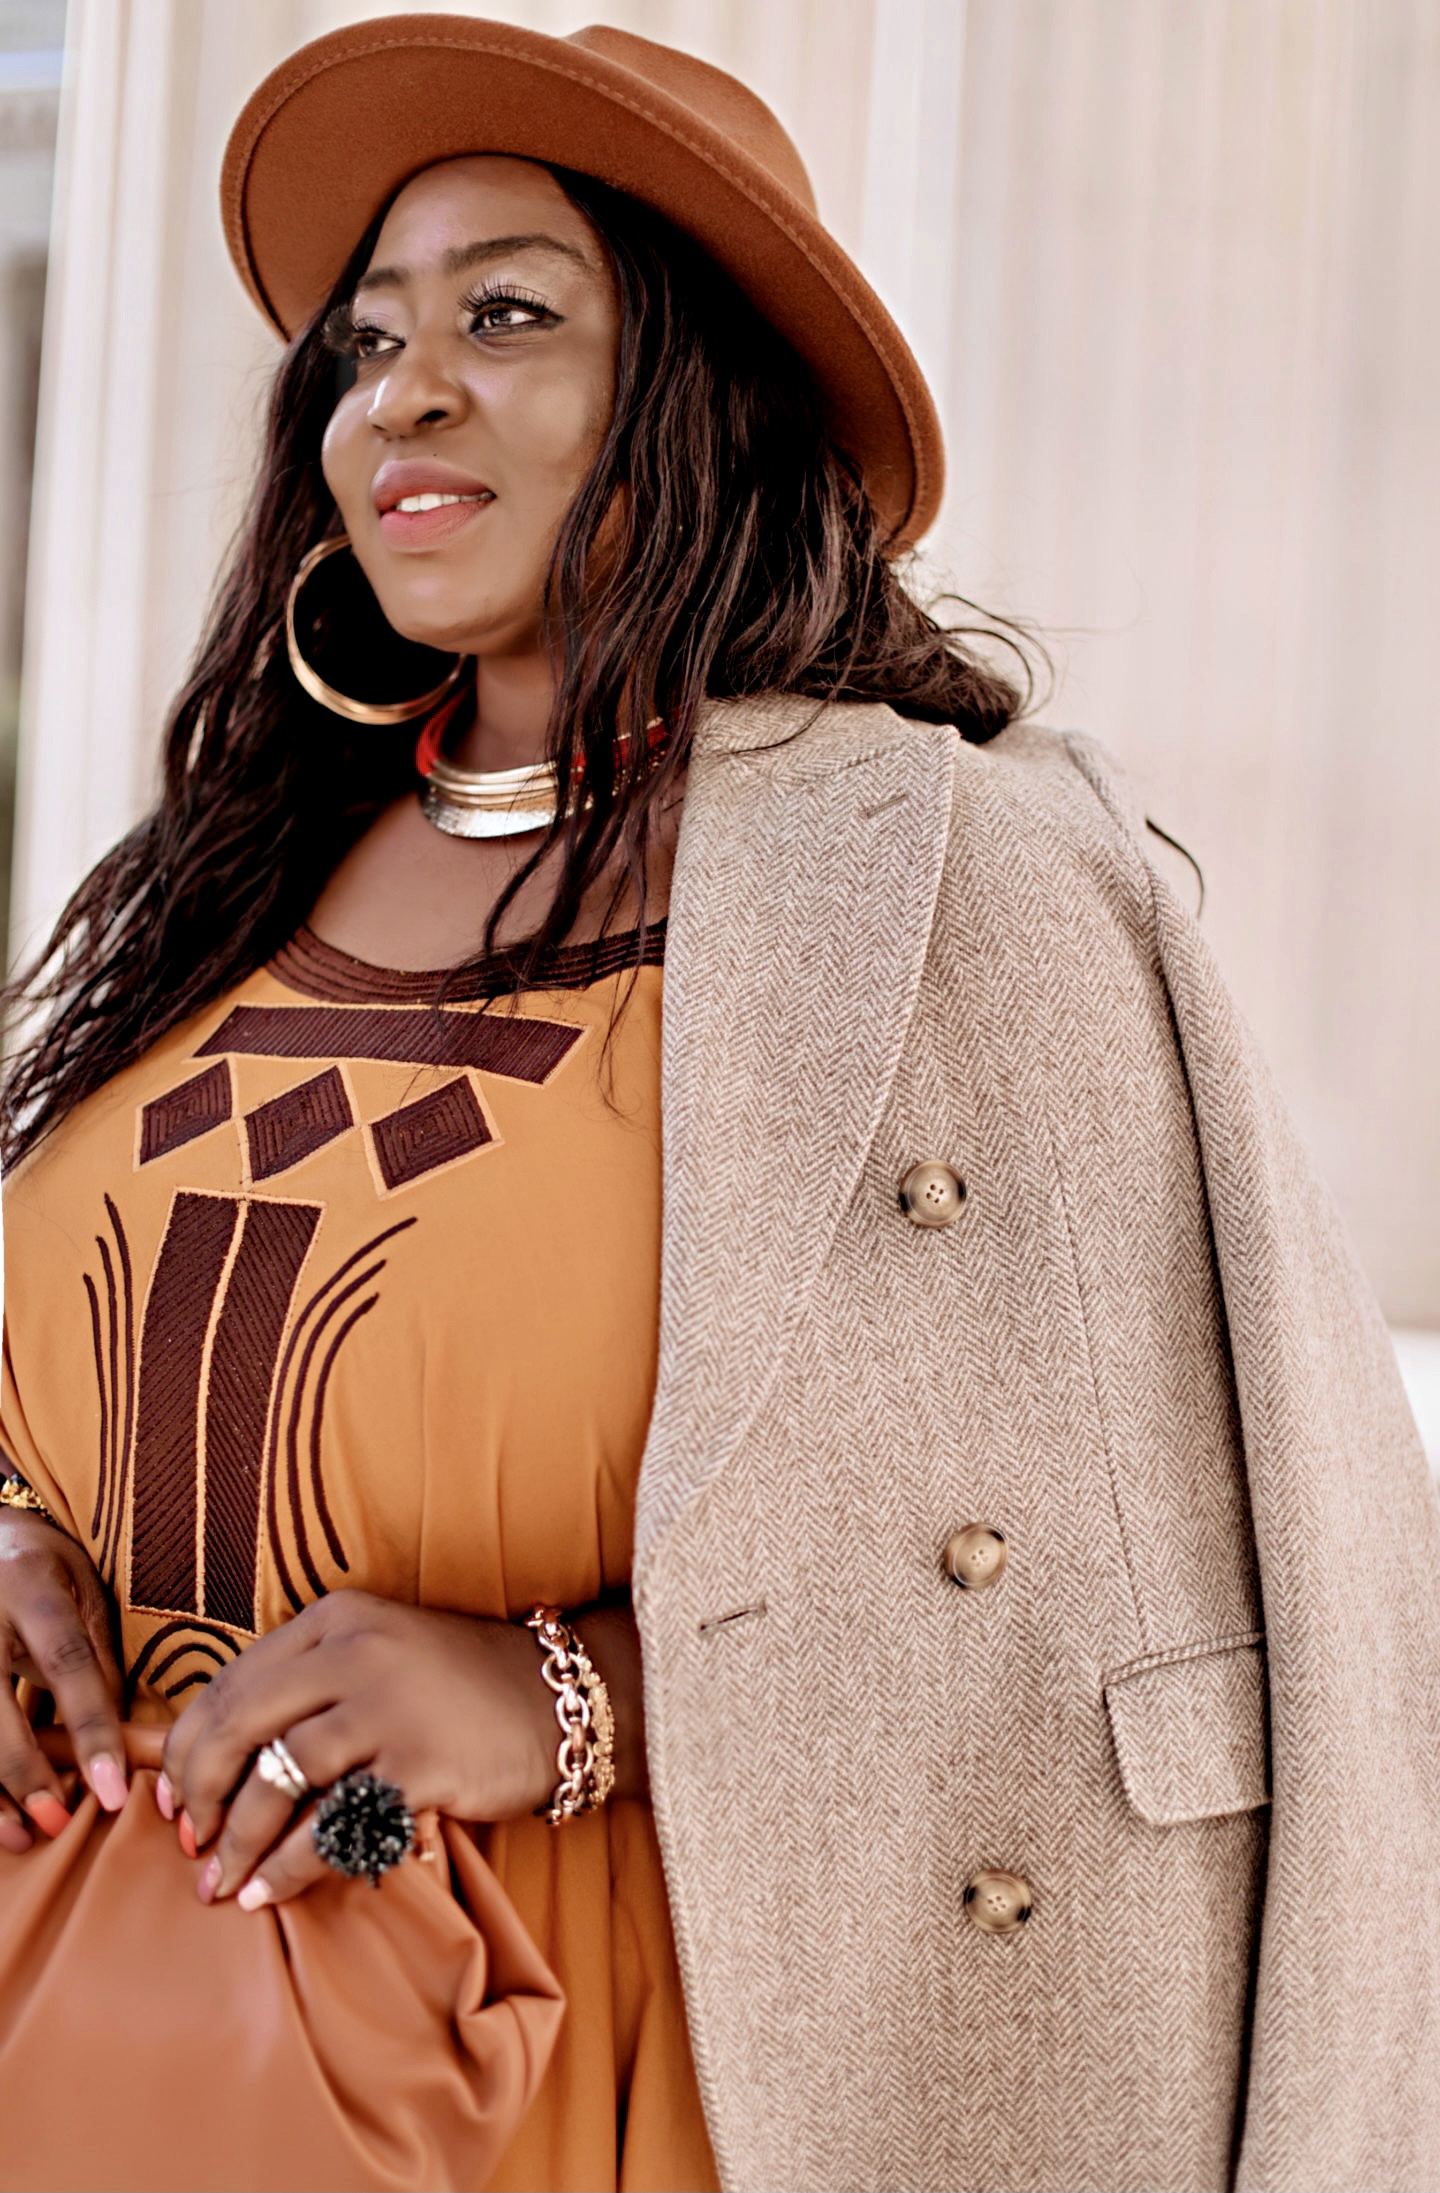 Fall-style-orange-dress-beige-coat-fedora-hat